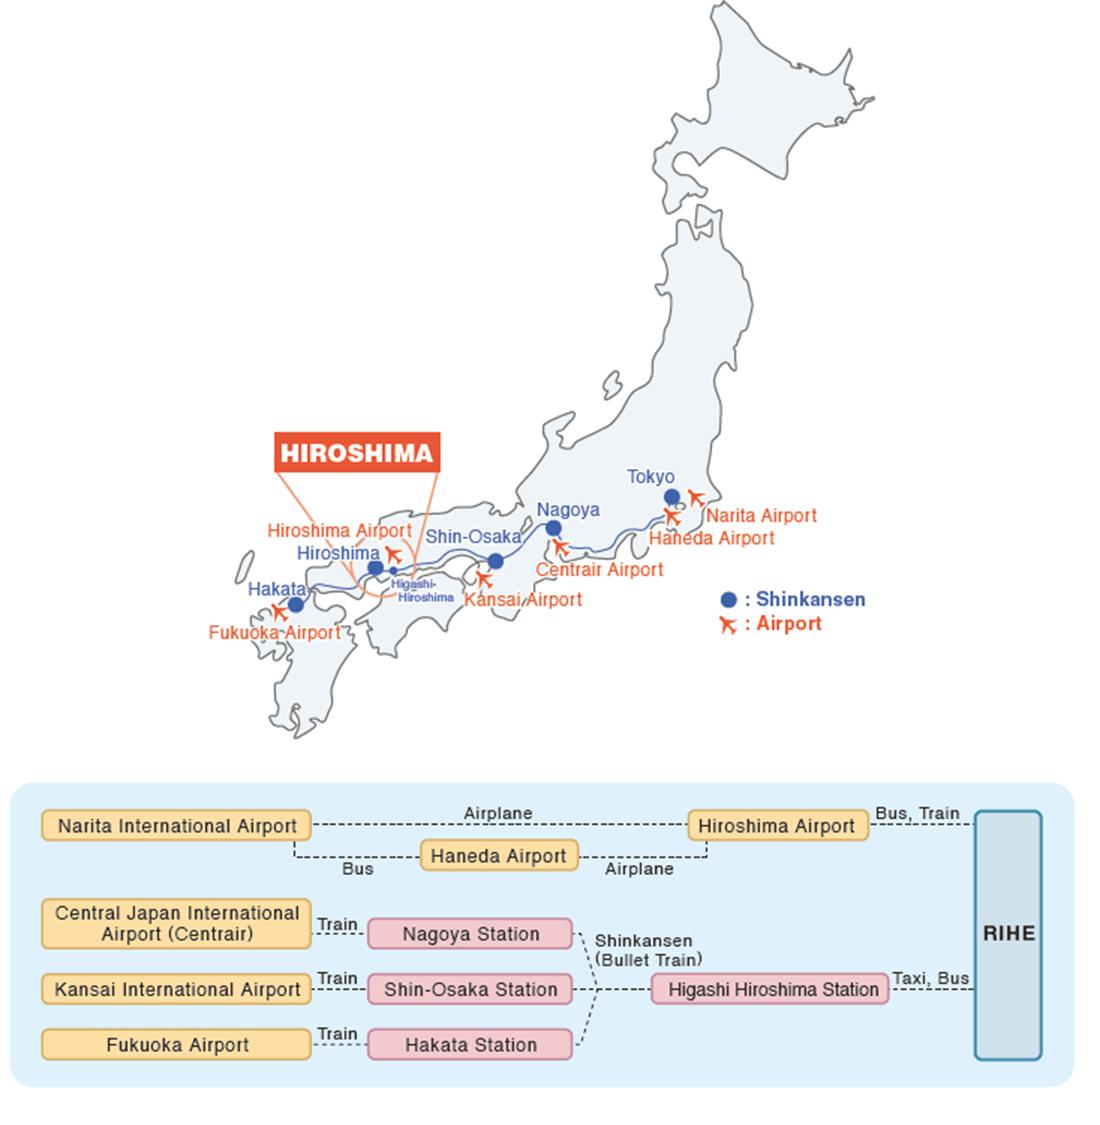 Access to RIHE (Higashi-hiroshima Campus)